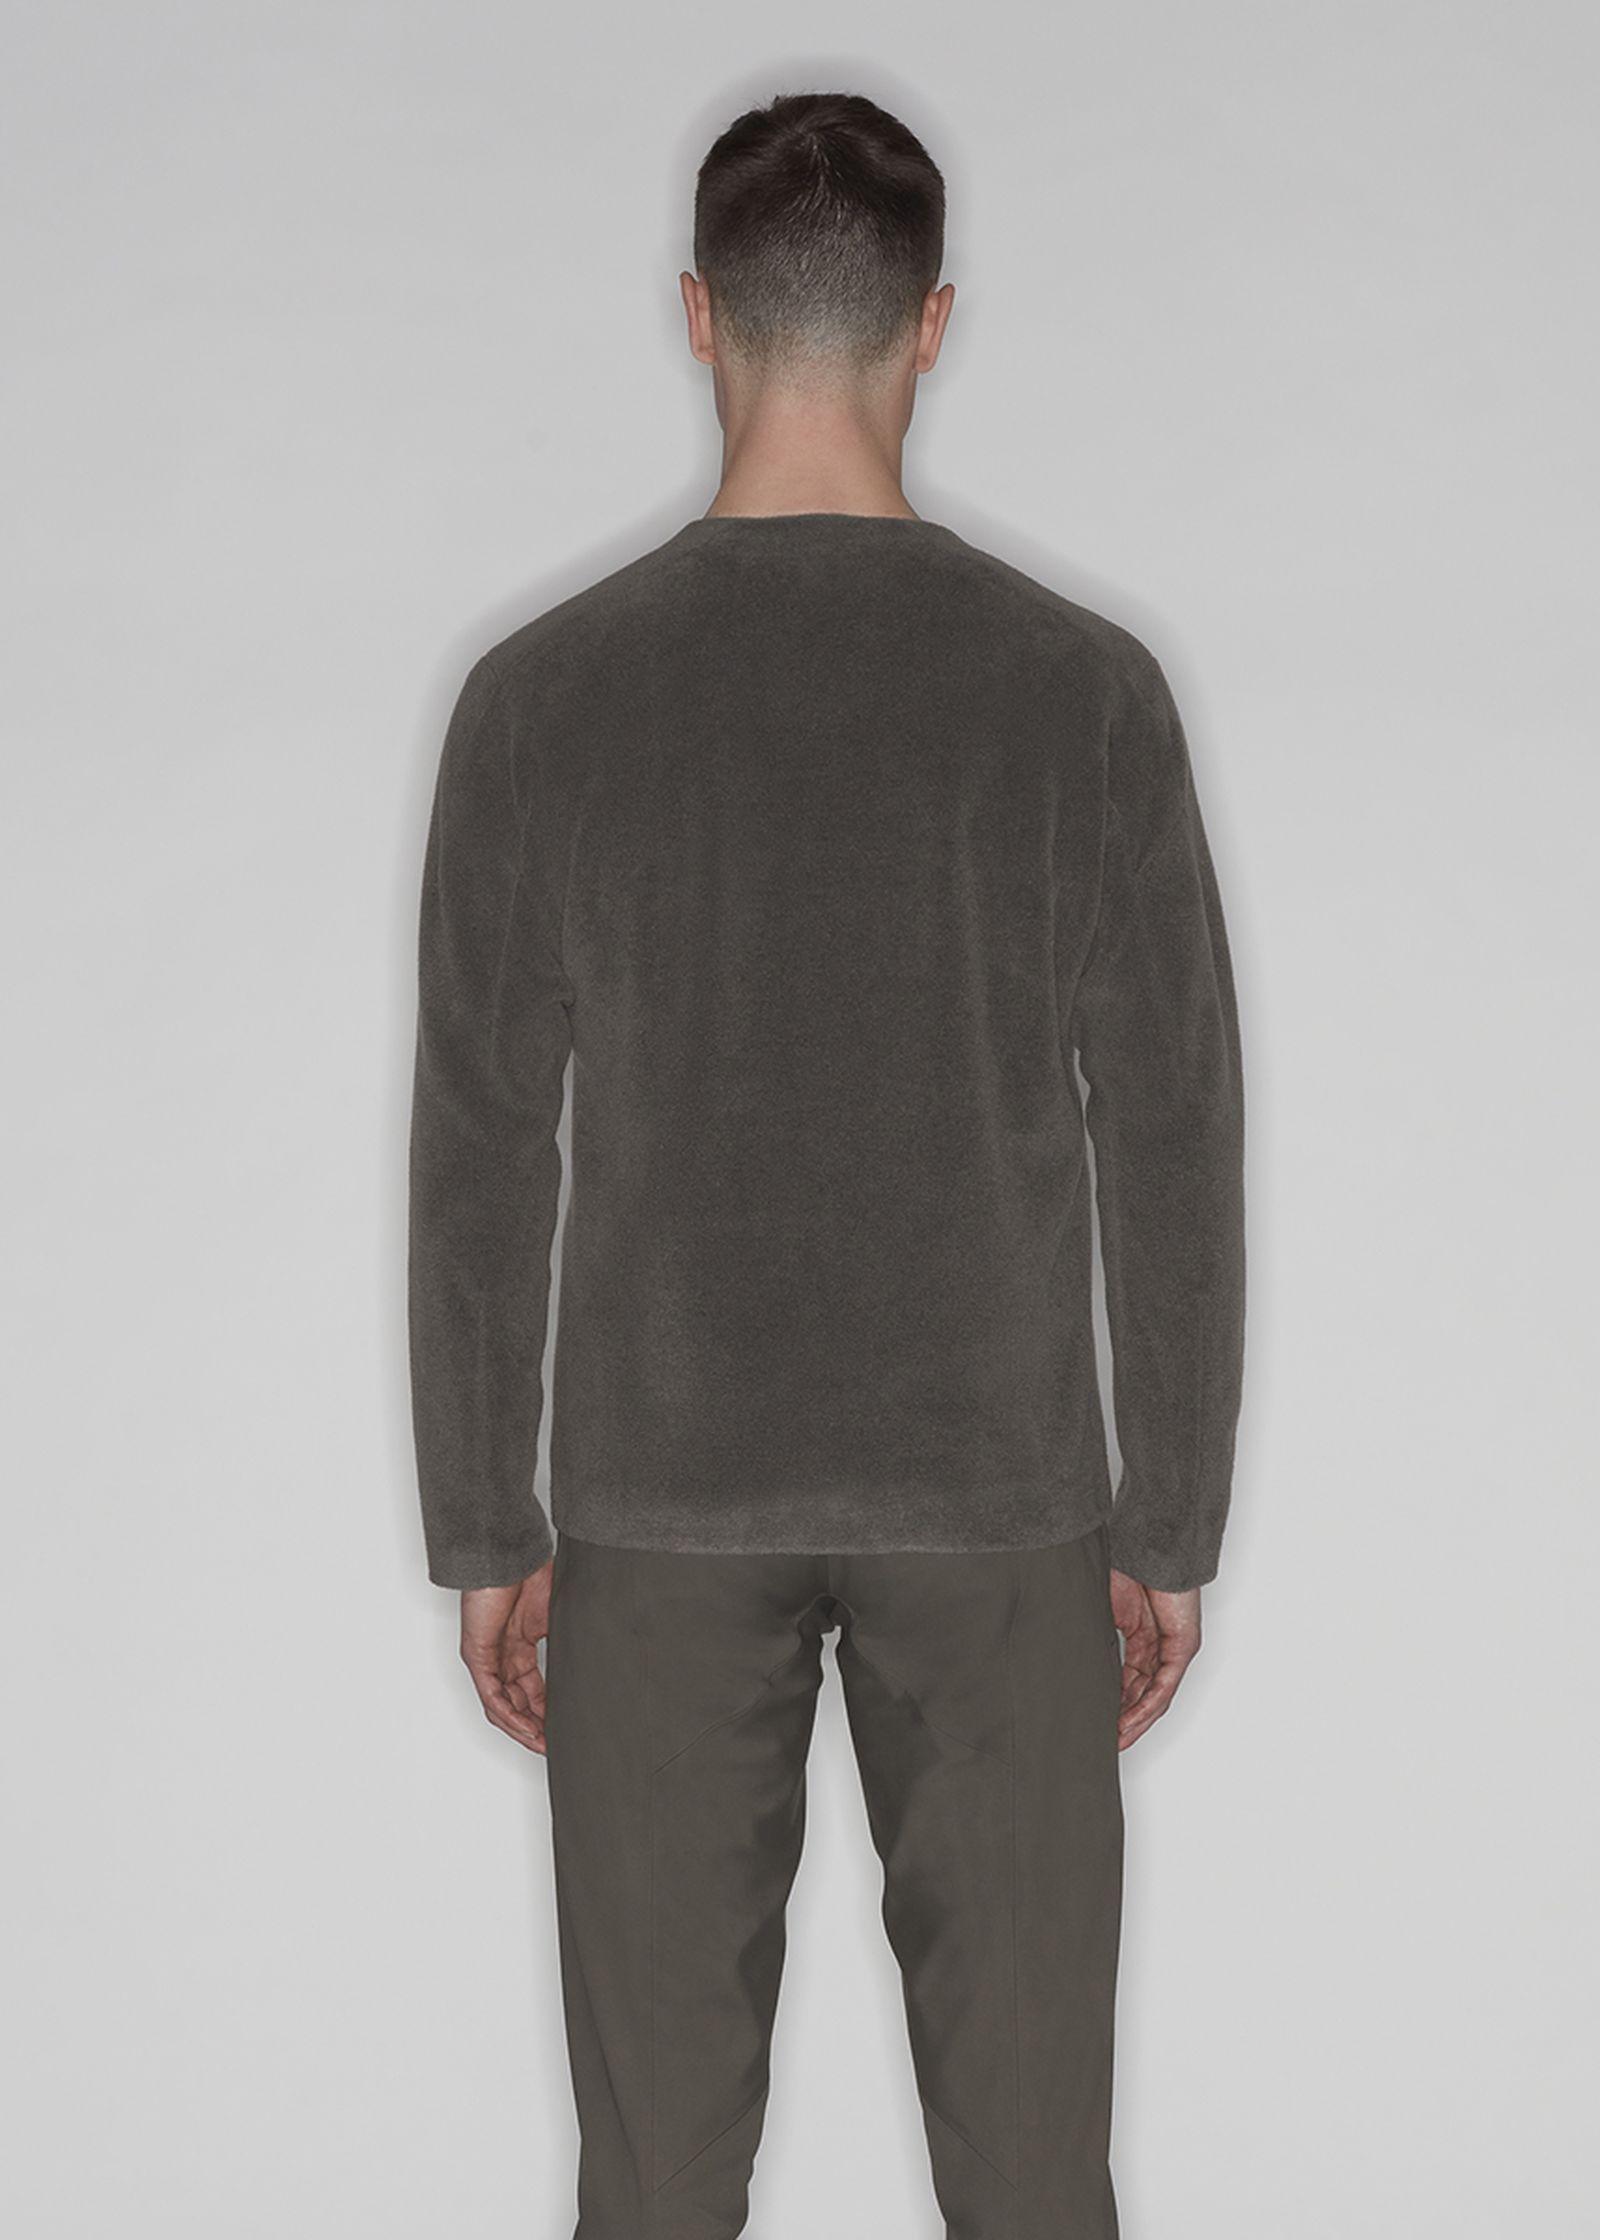 Veilance Dinitz Sweater green